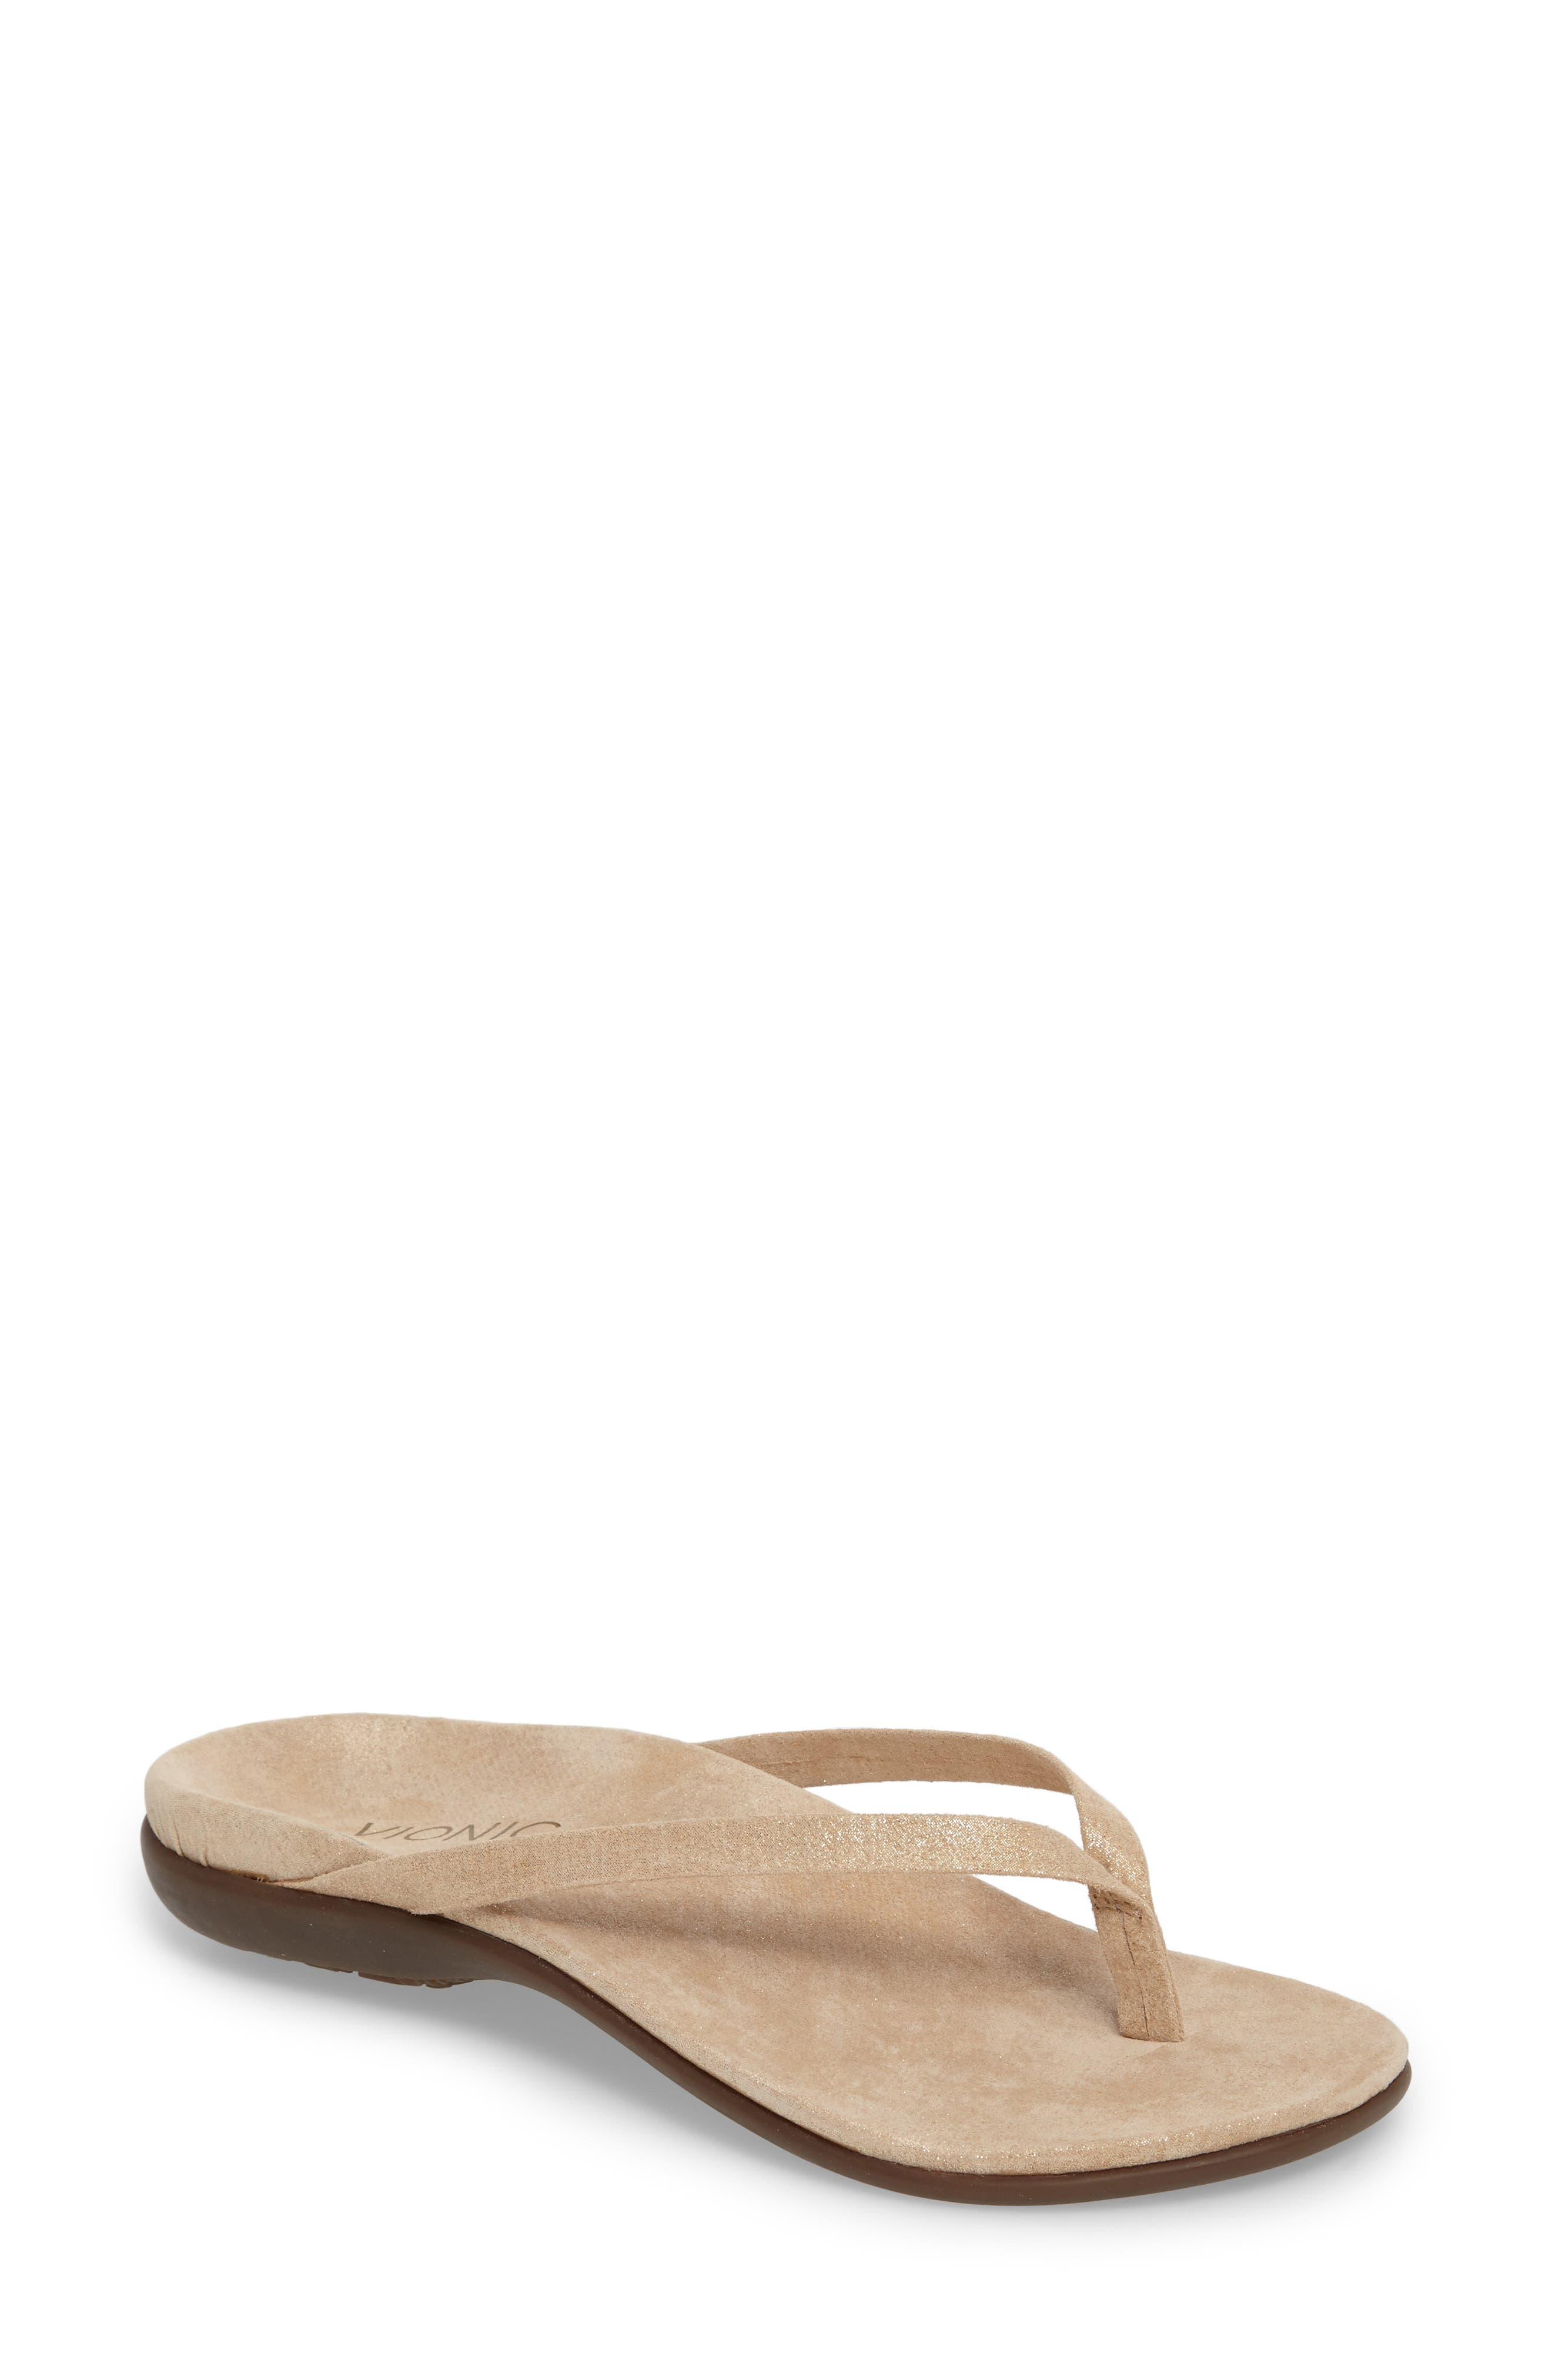 'Corfu' Sandal,                             Main thumbnail 1, color,                             290